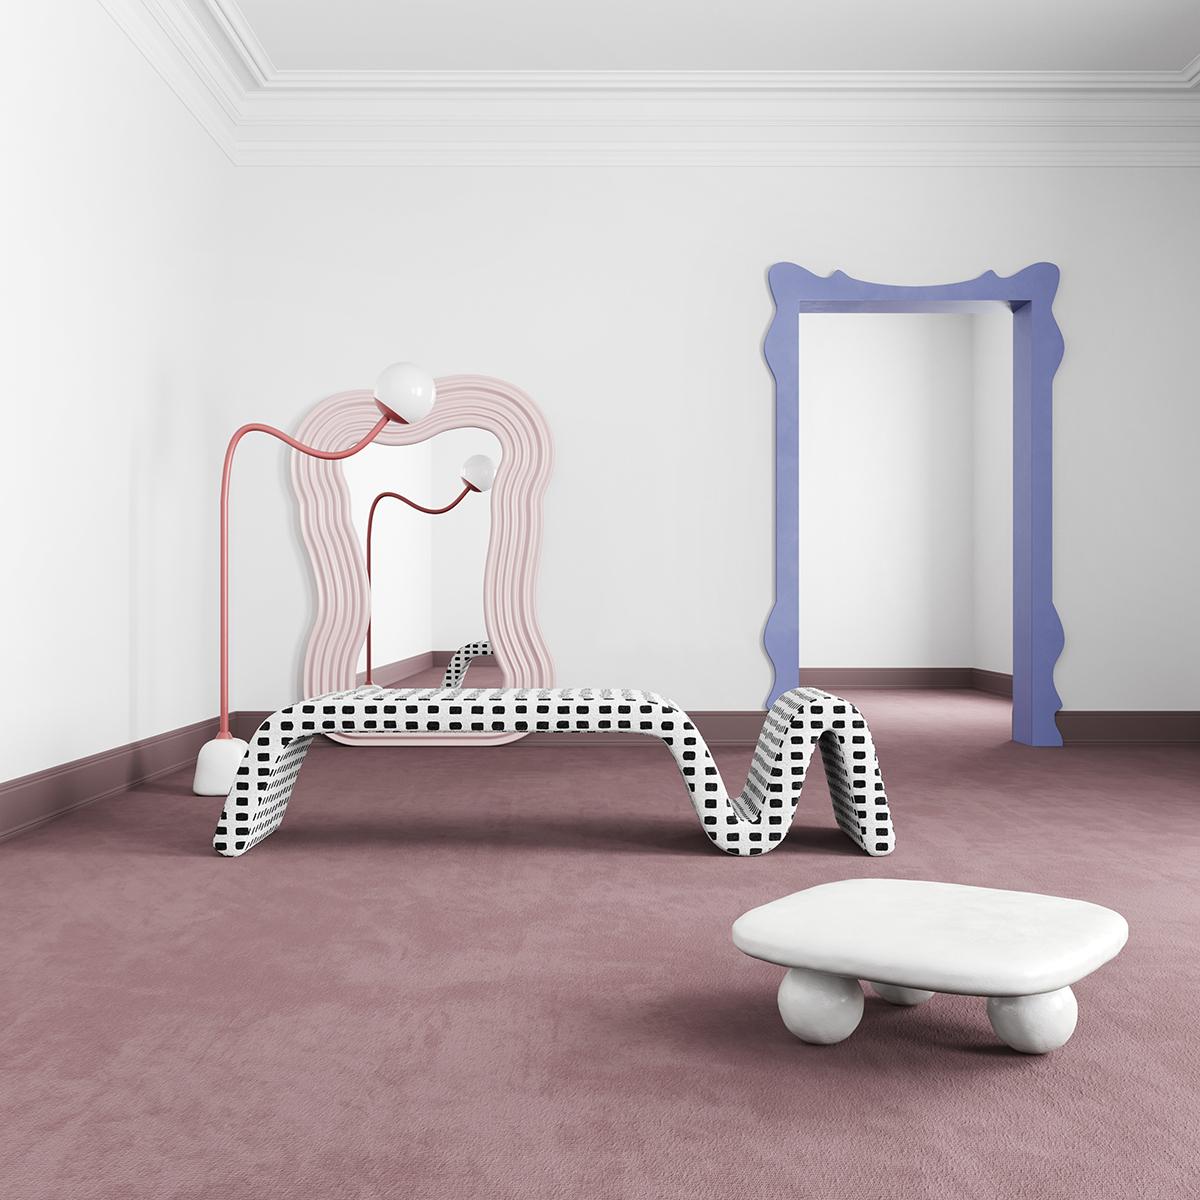 Postmodern Memphis interior trend